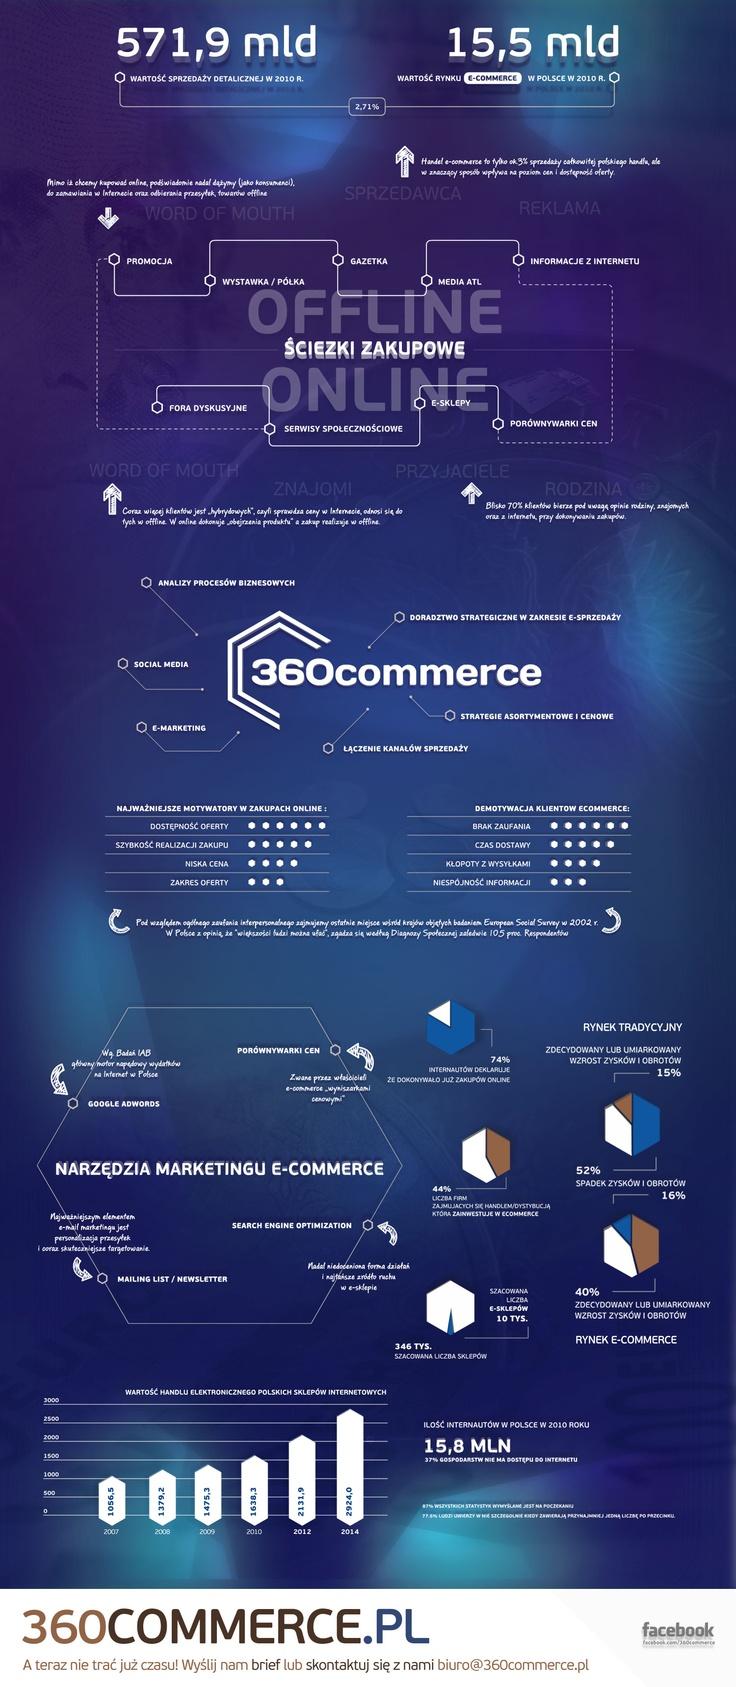 Potencjał rynku e-commerce #infografika